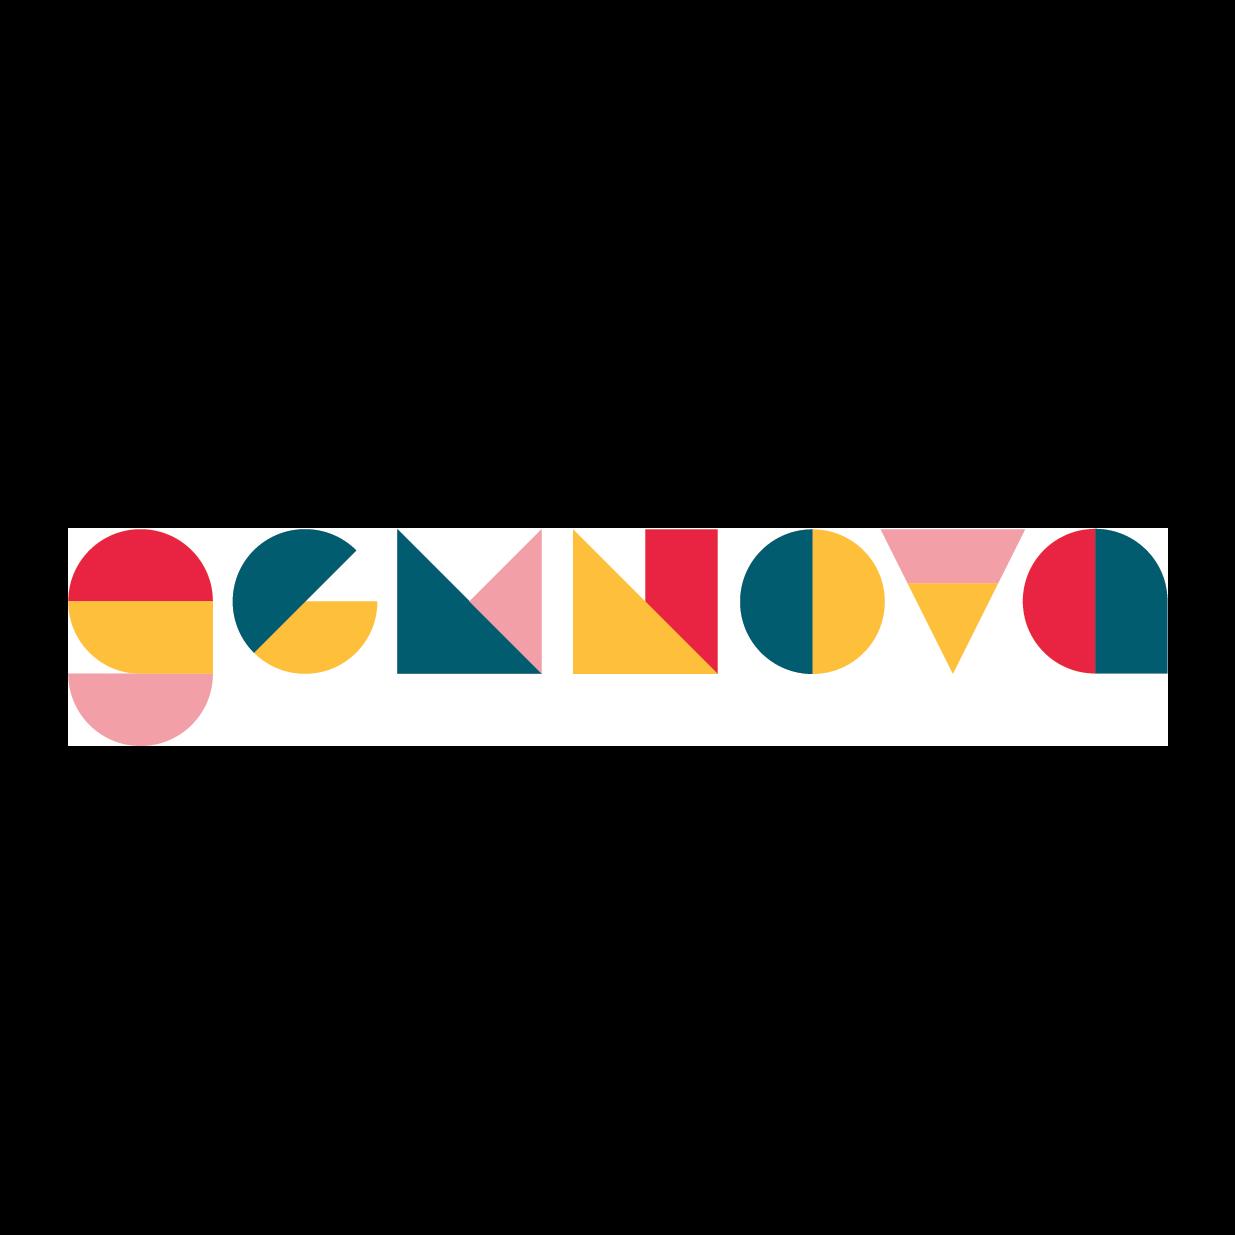 gemnoca-logo-quadratisch